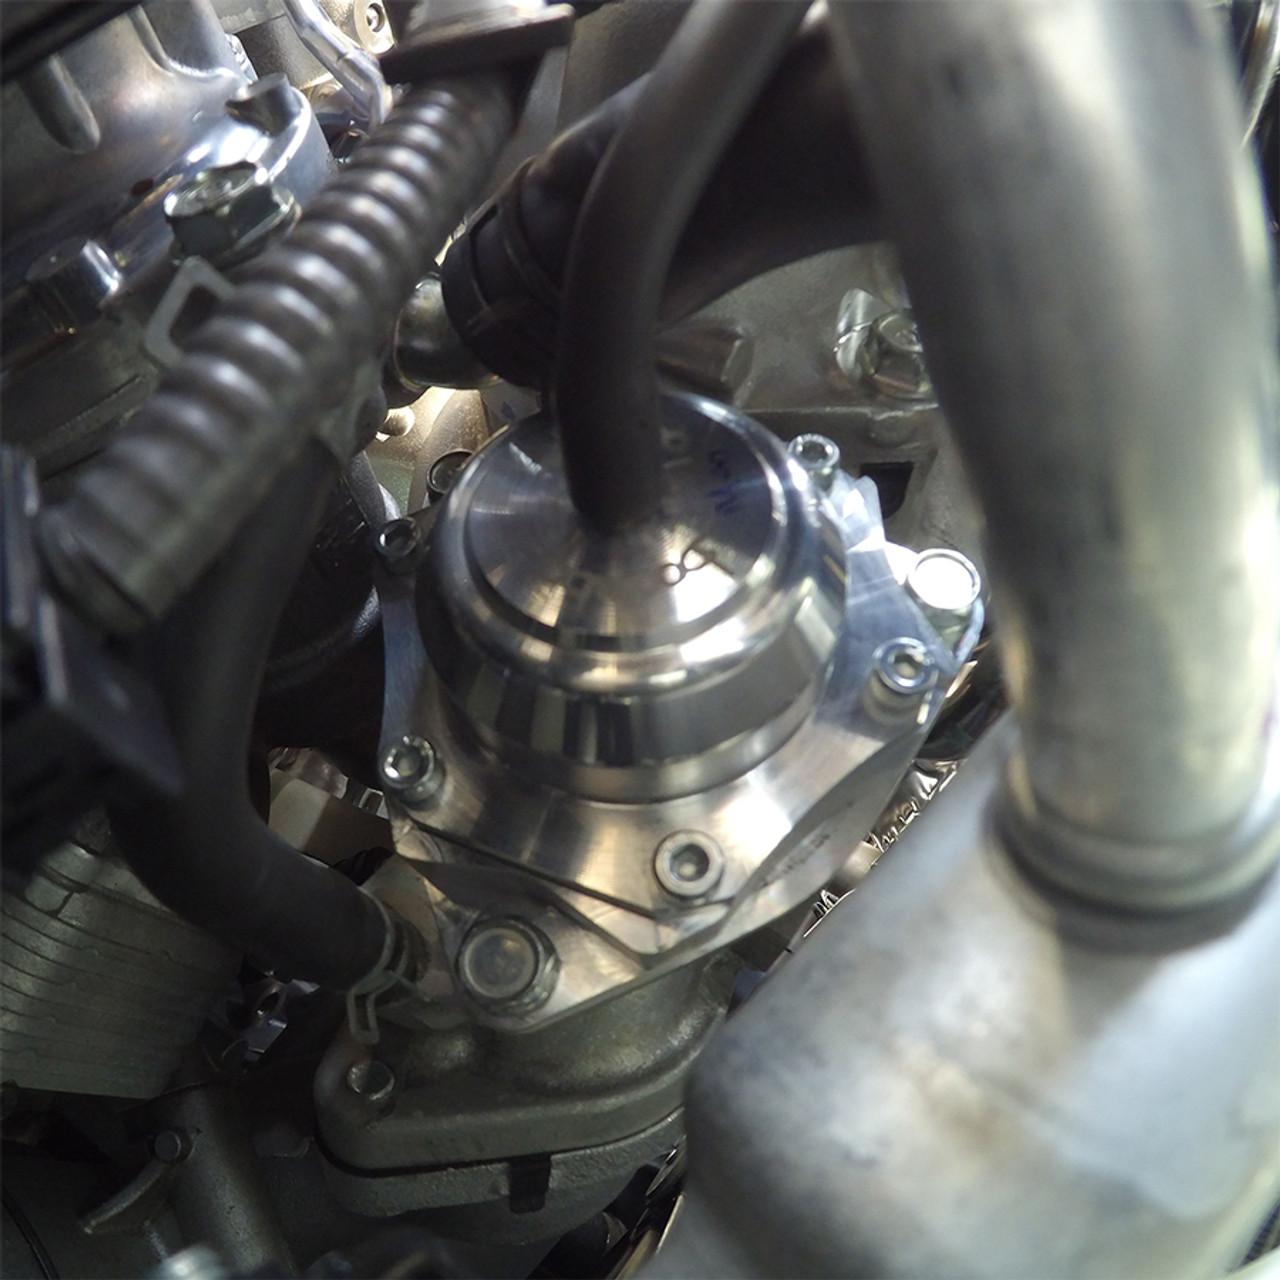 Honda 2.0 Turbo Recirculating Bypass Valve (BPV) Civic Type-R / Accord 2.0T